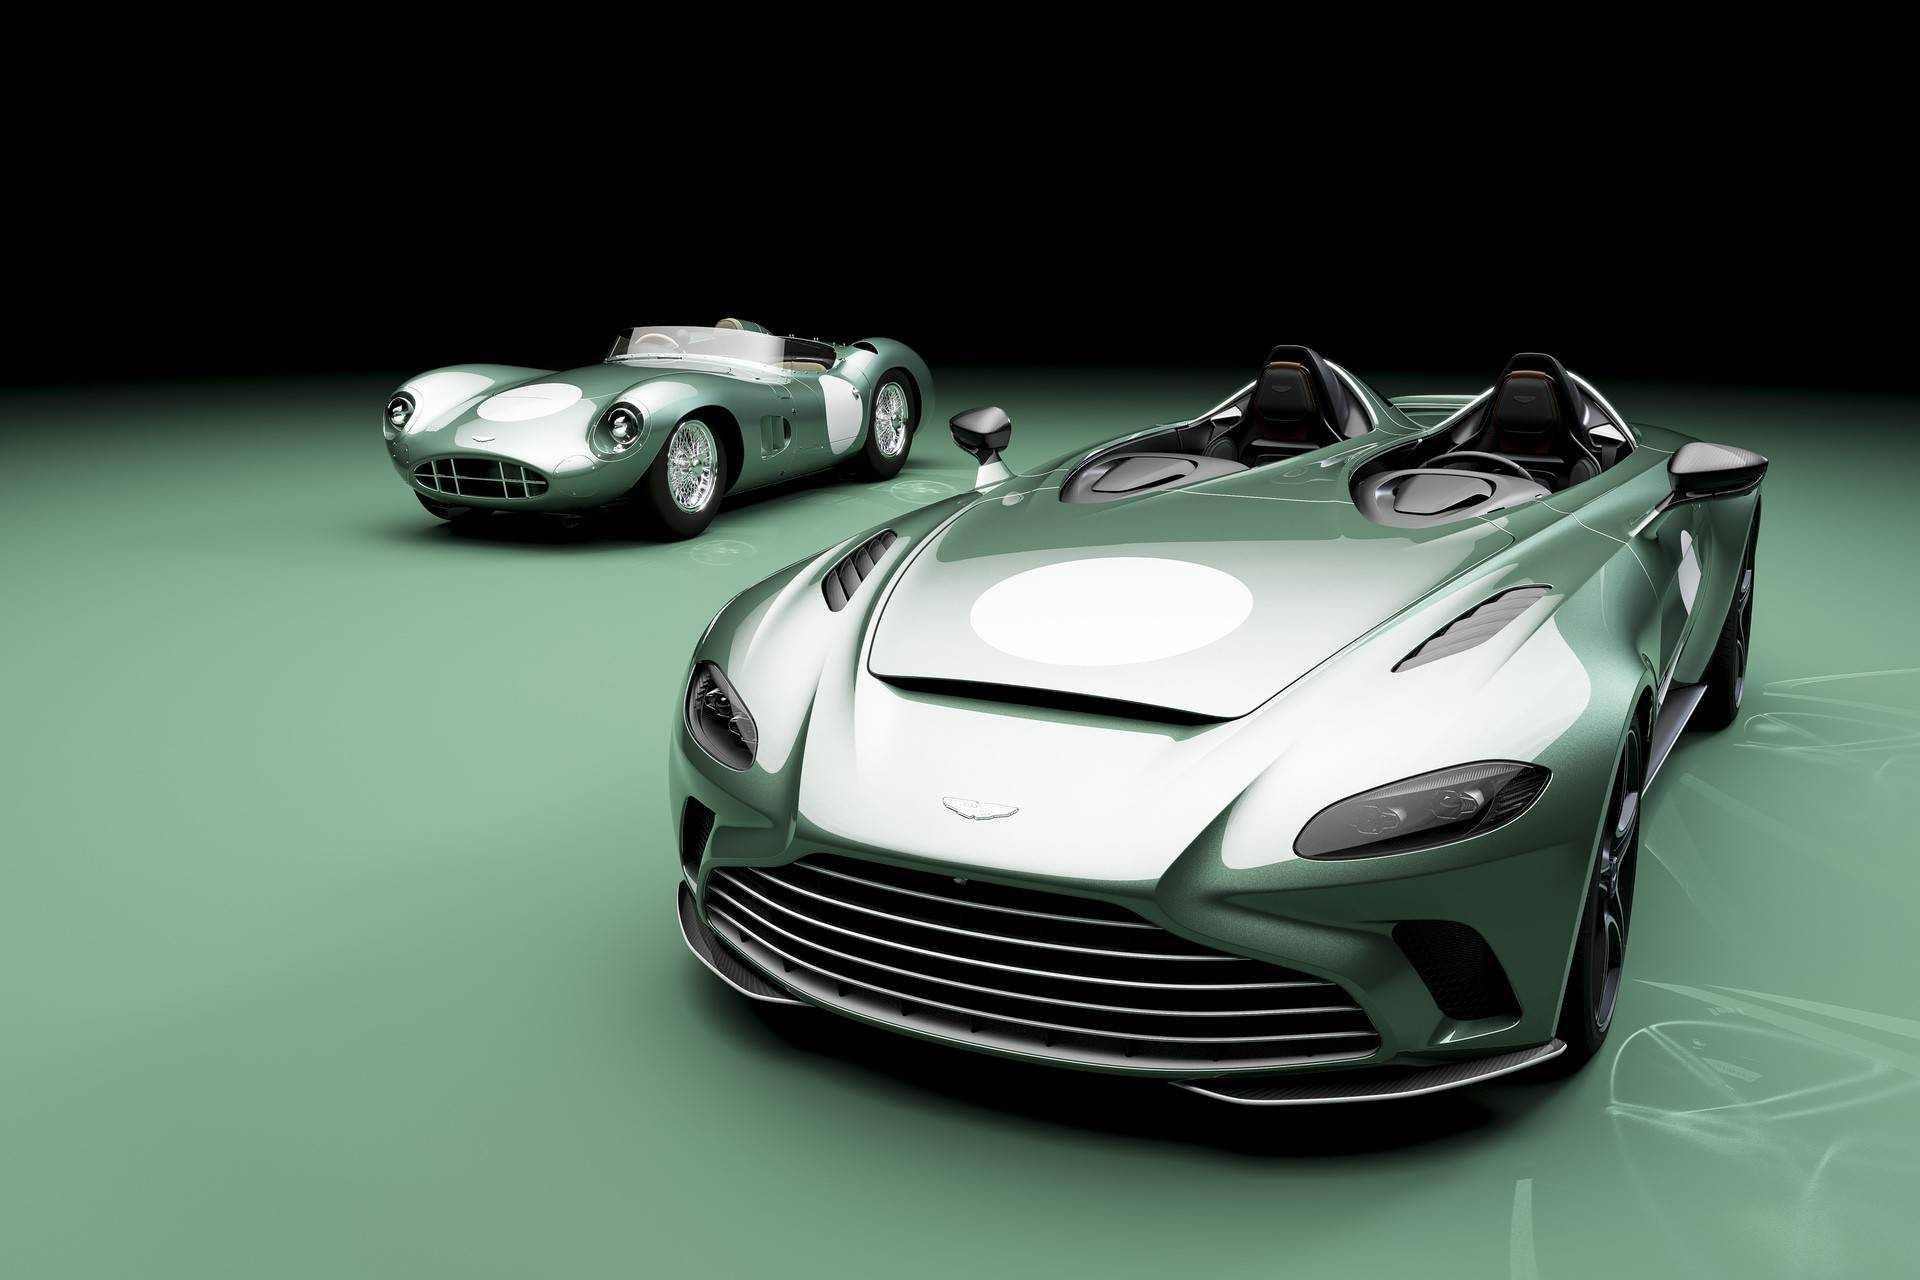 Aston_Martin_V12_Speedster_DBR1_Pack-0005